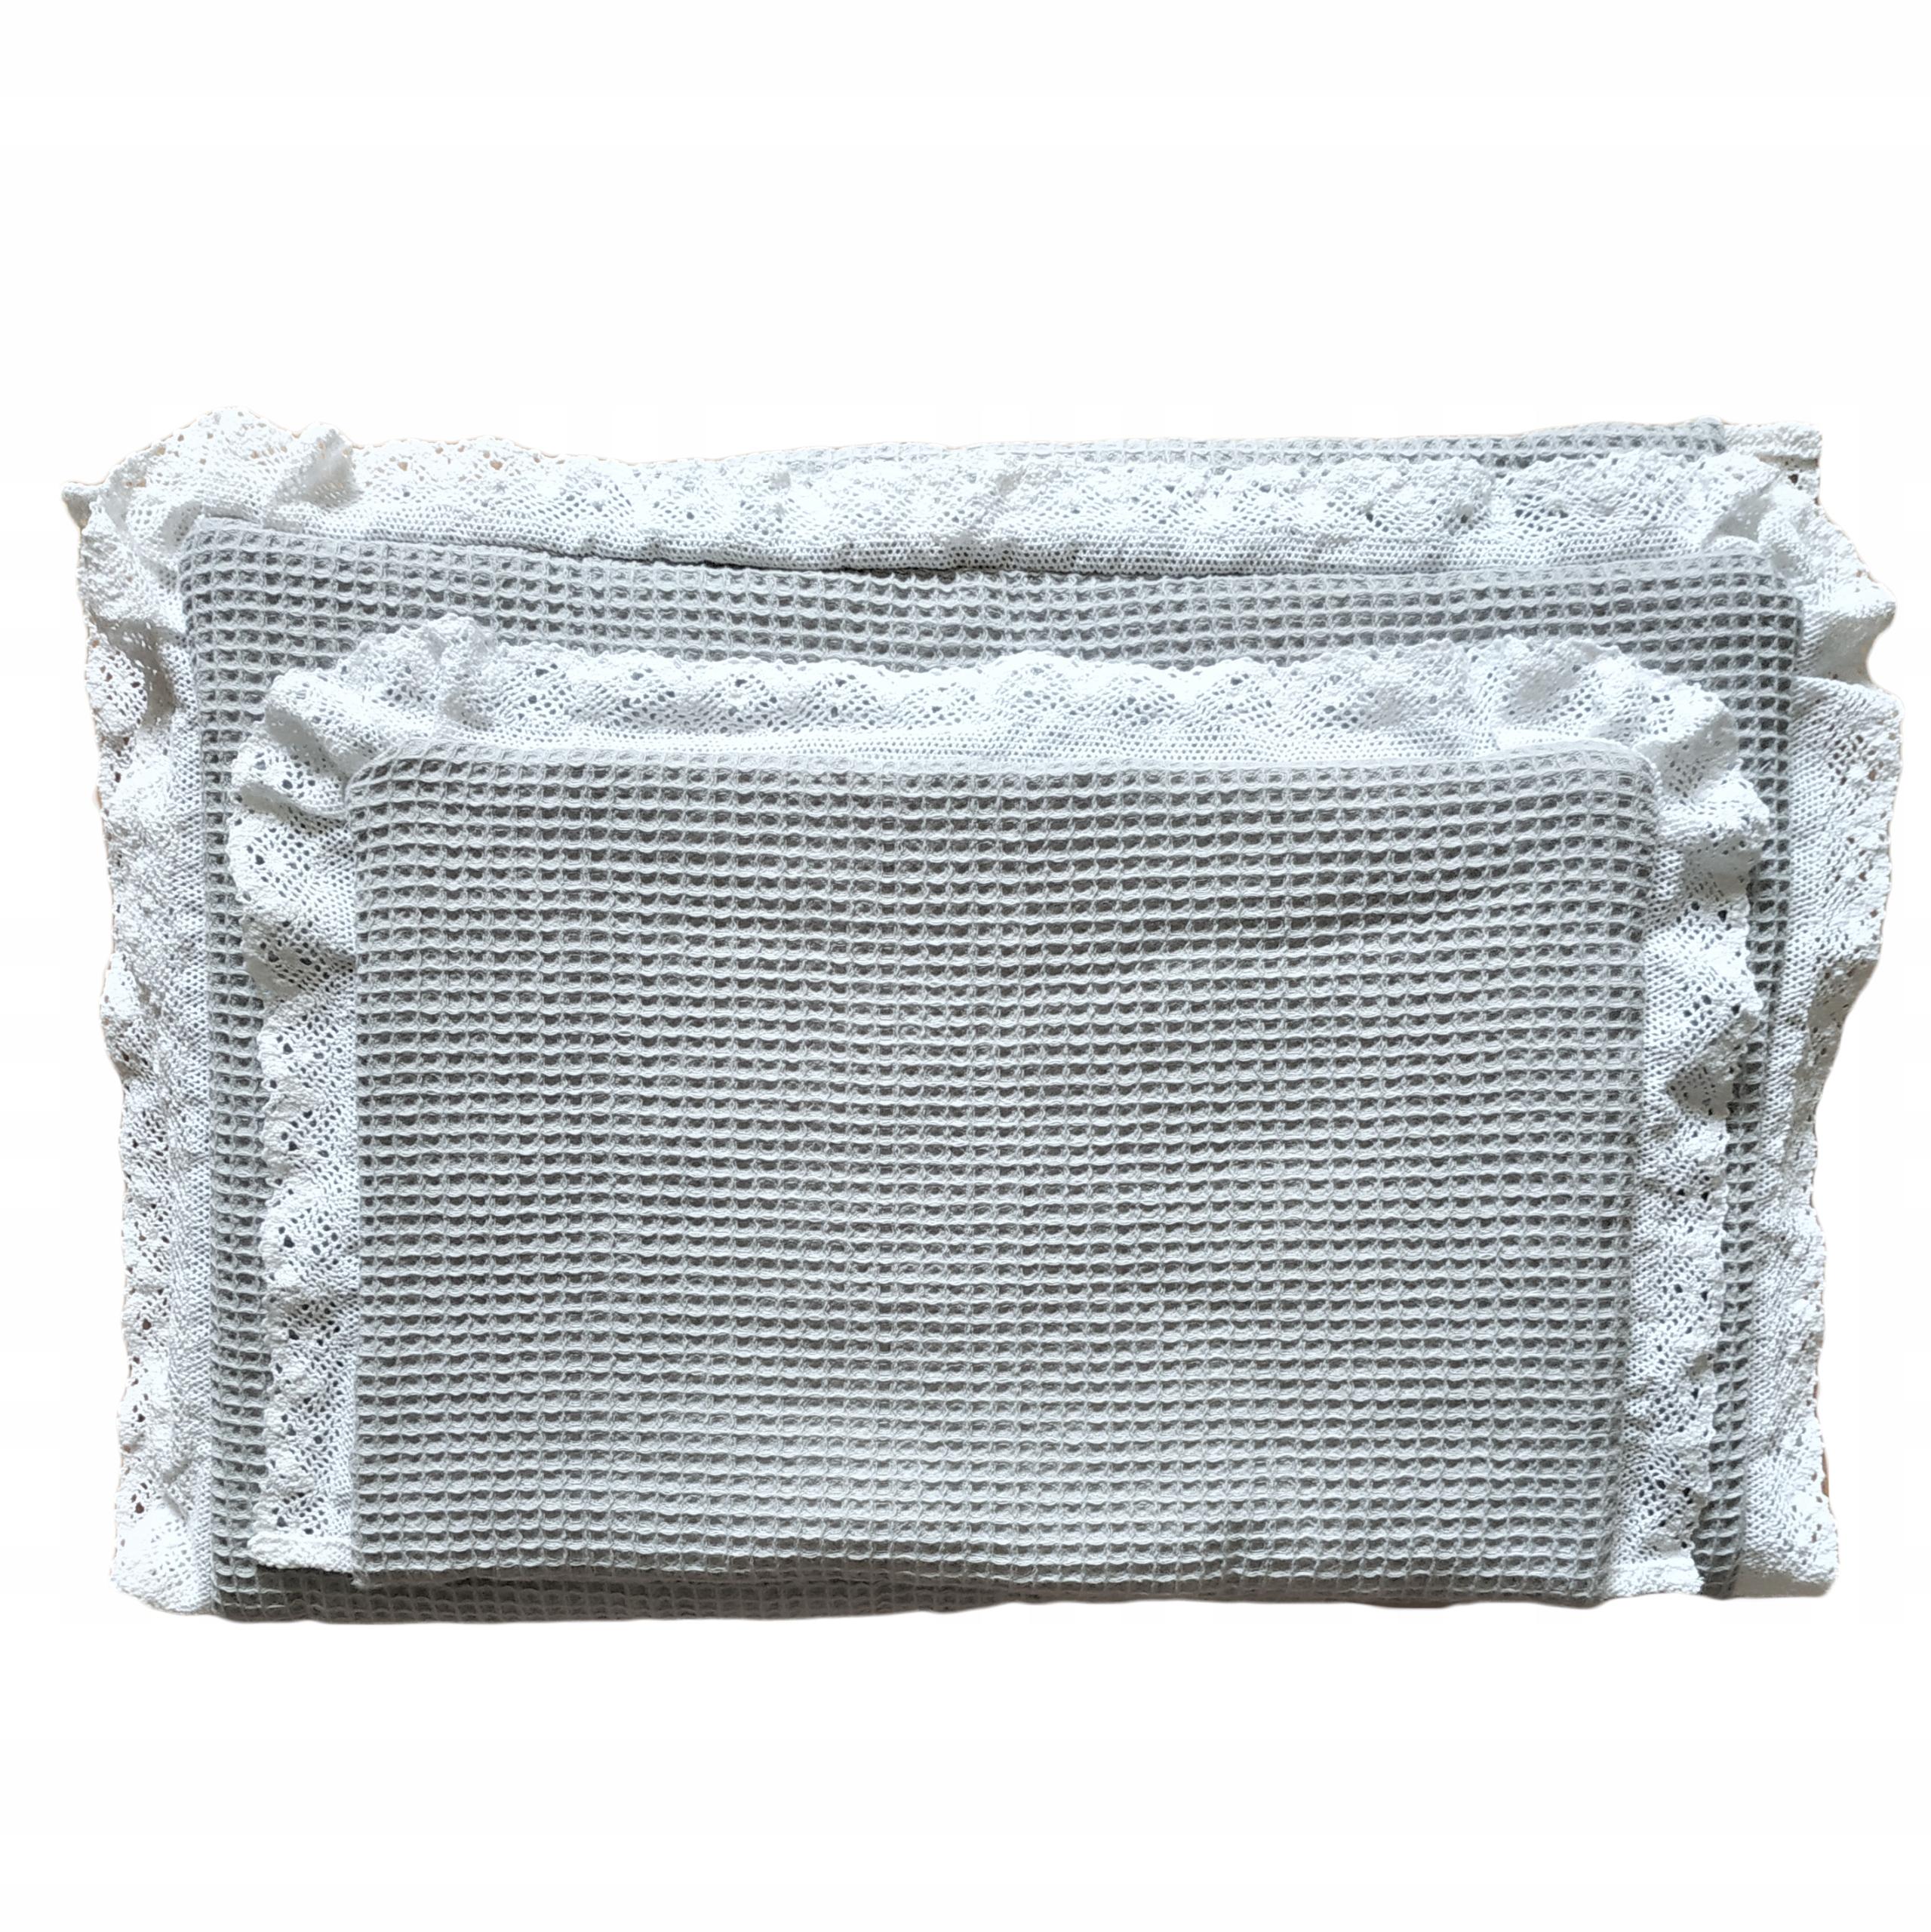 100% bavlnená vaflová podstielka pre kočík